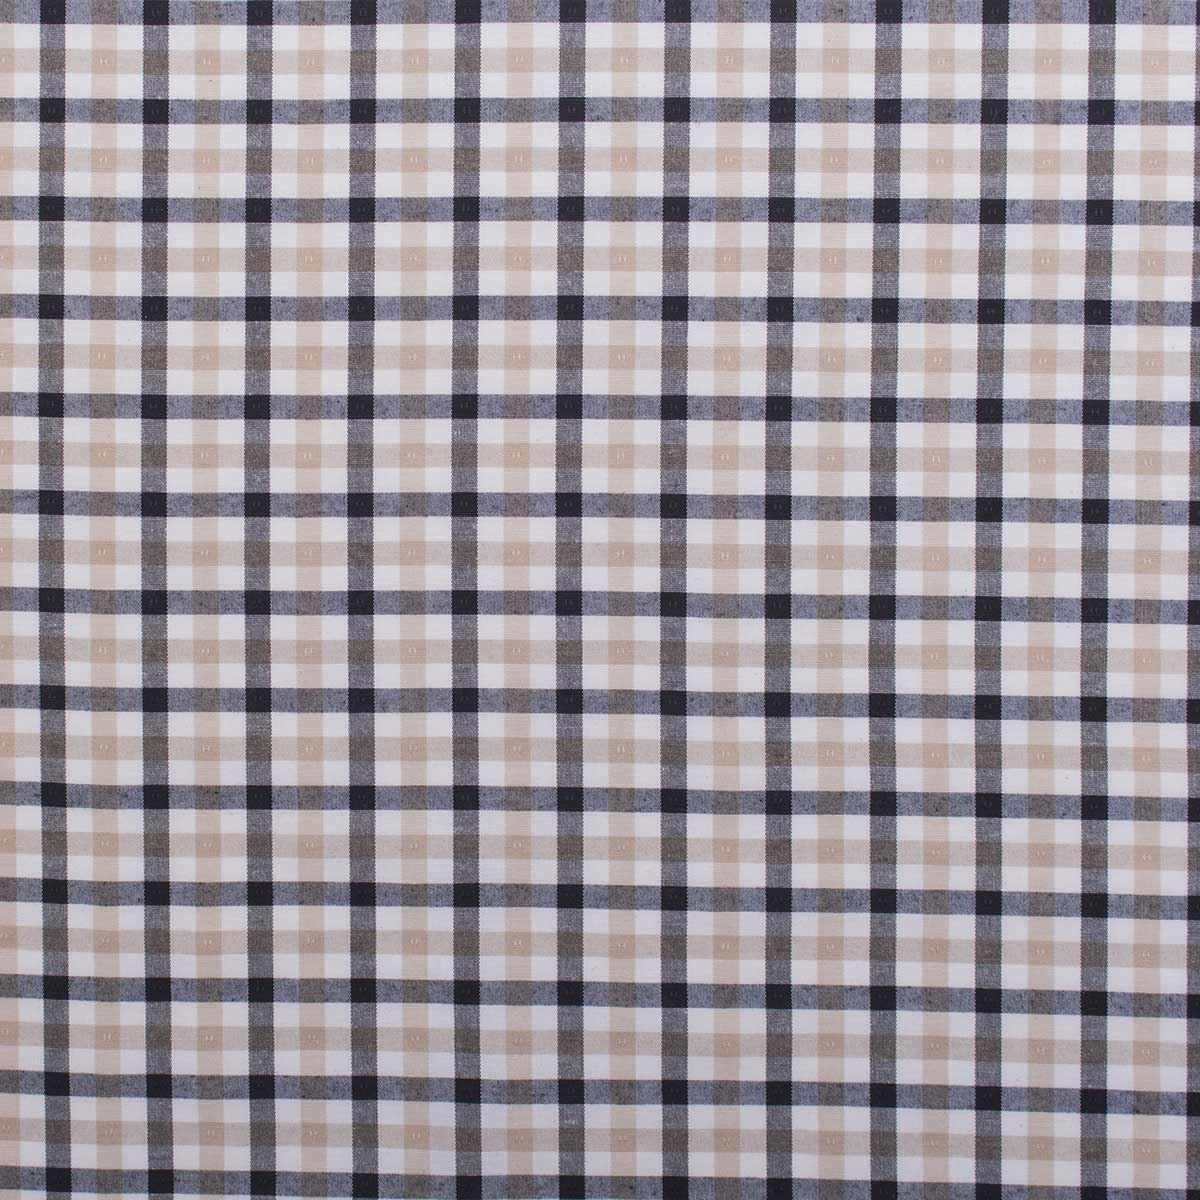 Brewster Check Tartan Black White And Beige Plaid Cotton Look